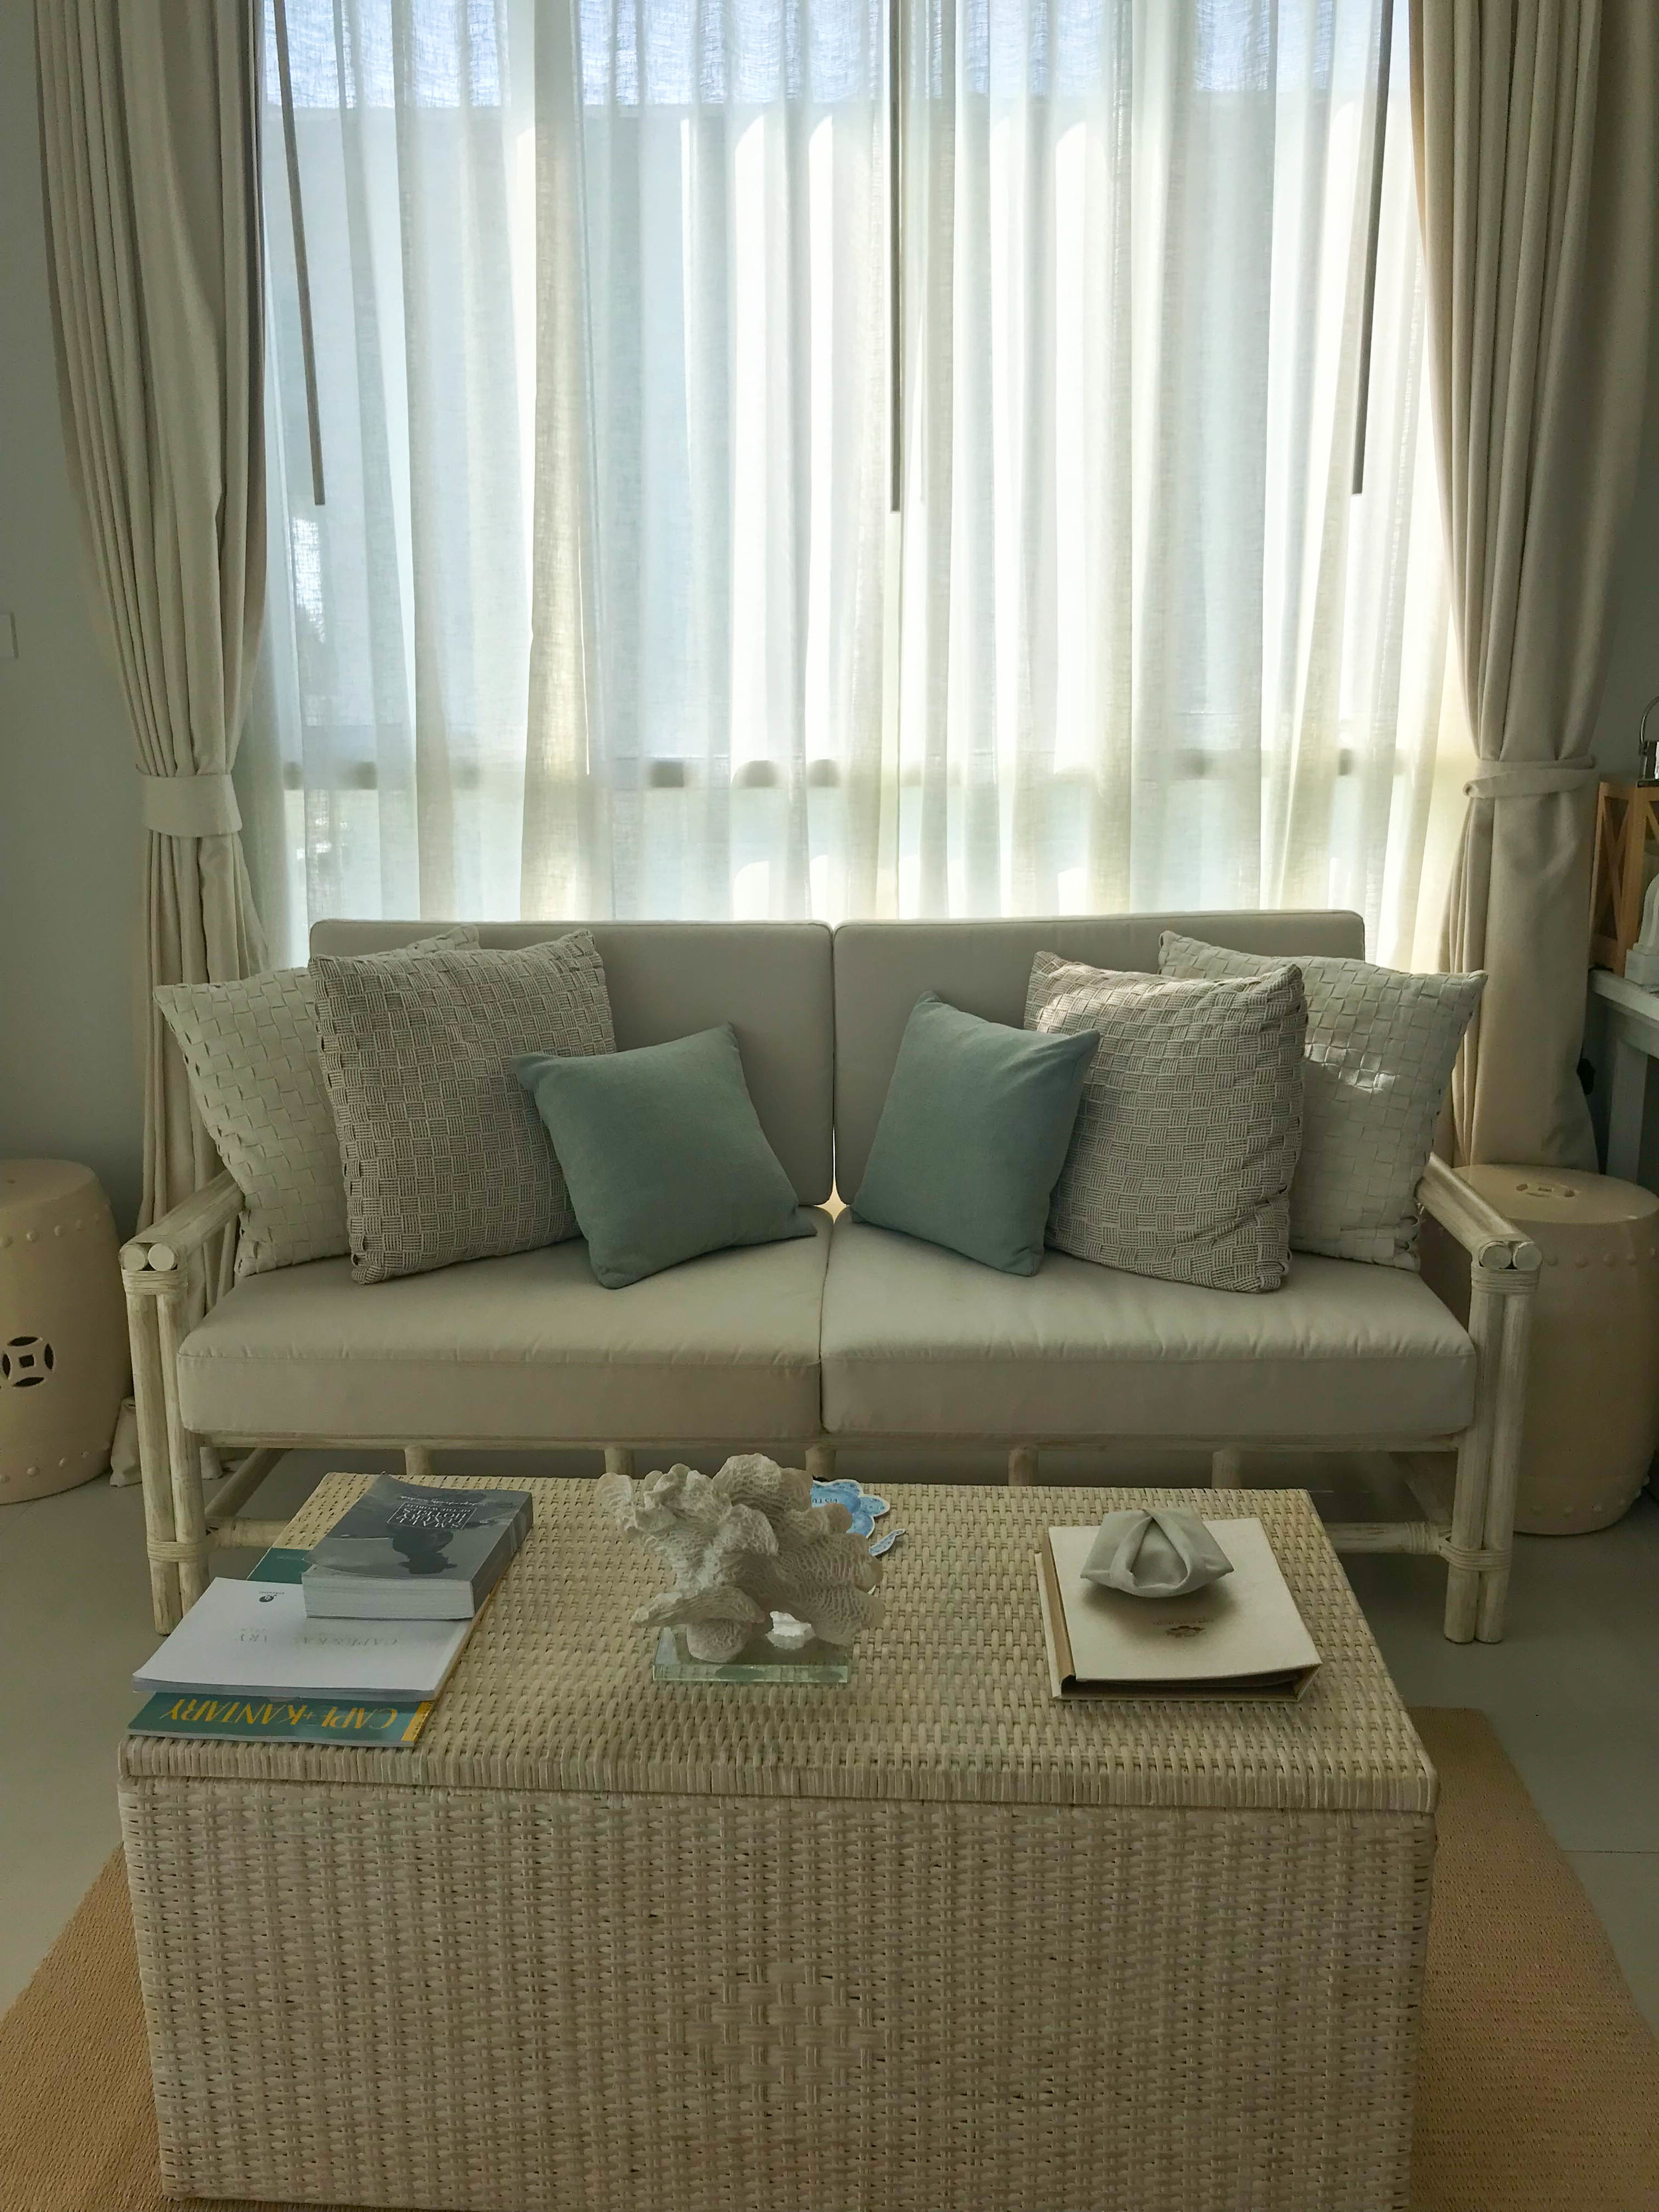 Thailand Cape Kudu Hotel Koh Yao Noi - coastal living room area